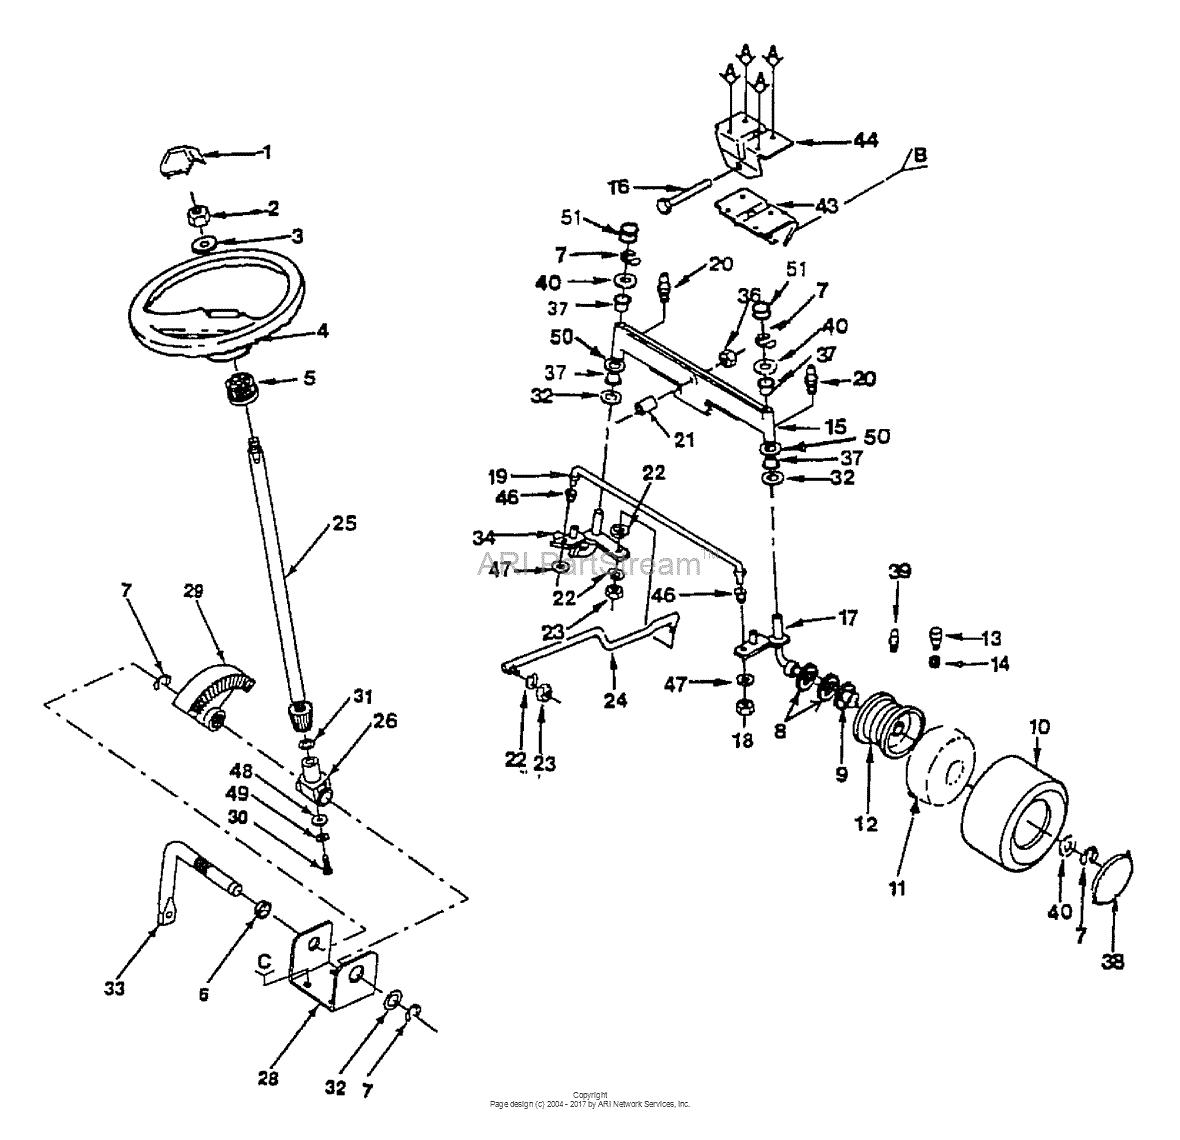 hight resolution of husqvarna gt 160 h1644c 1991 08 parts diagram for steering